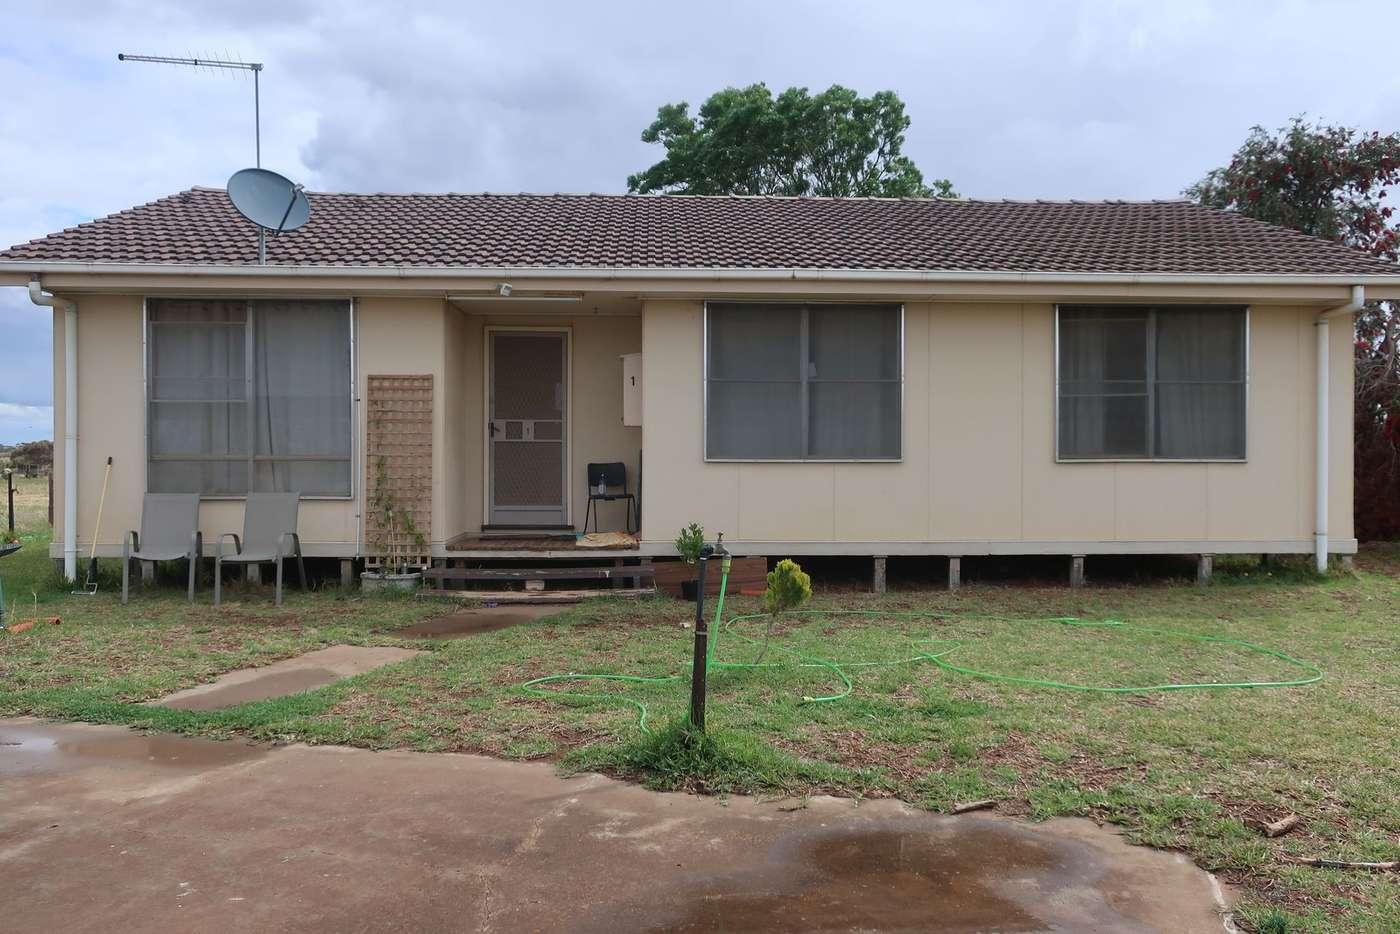 Main view of Homely house listing, 341 Twenty Third Street, Koorlong VIC 3501